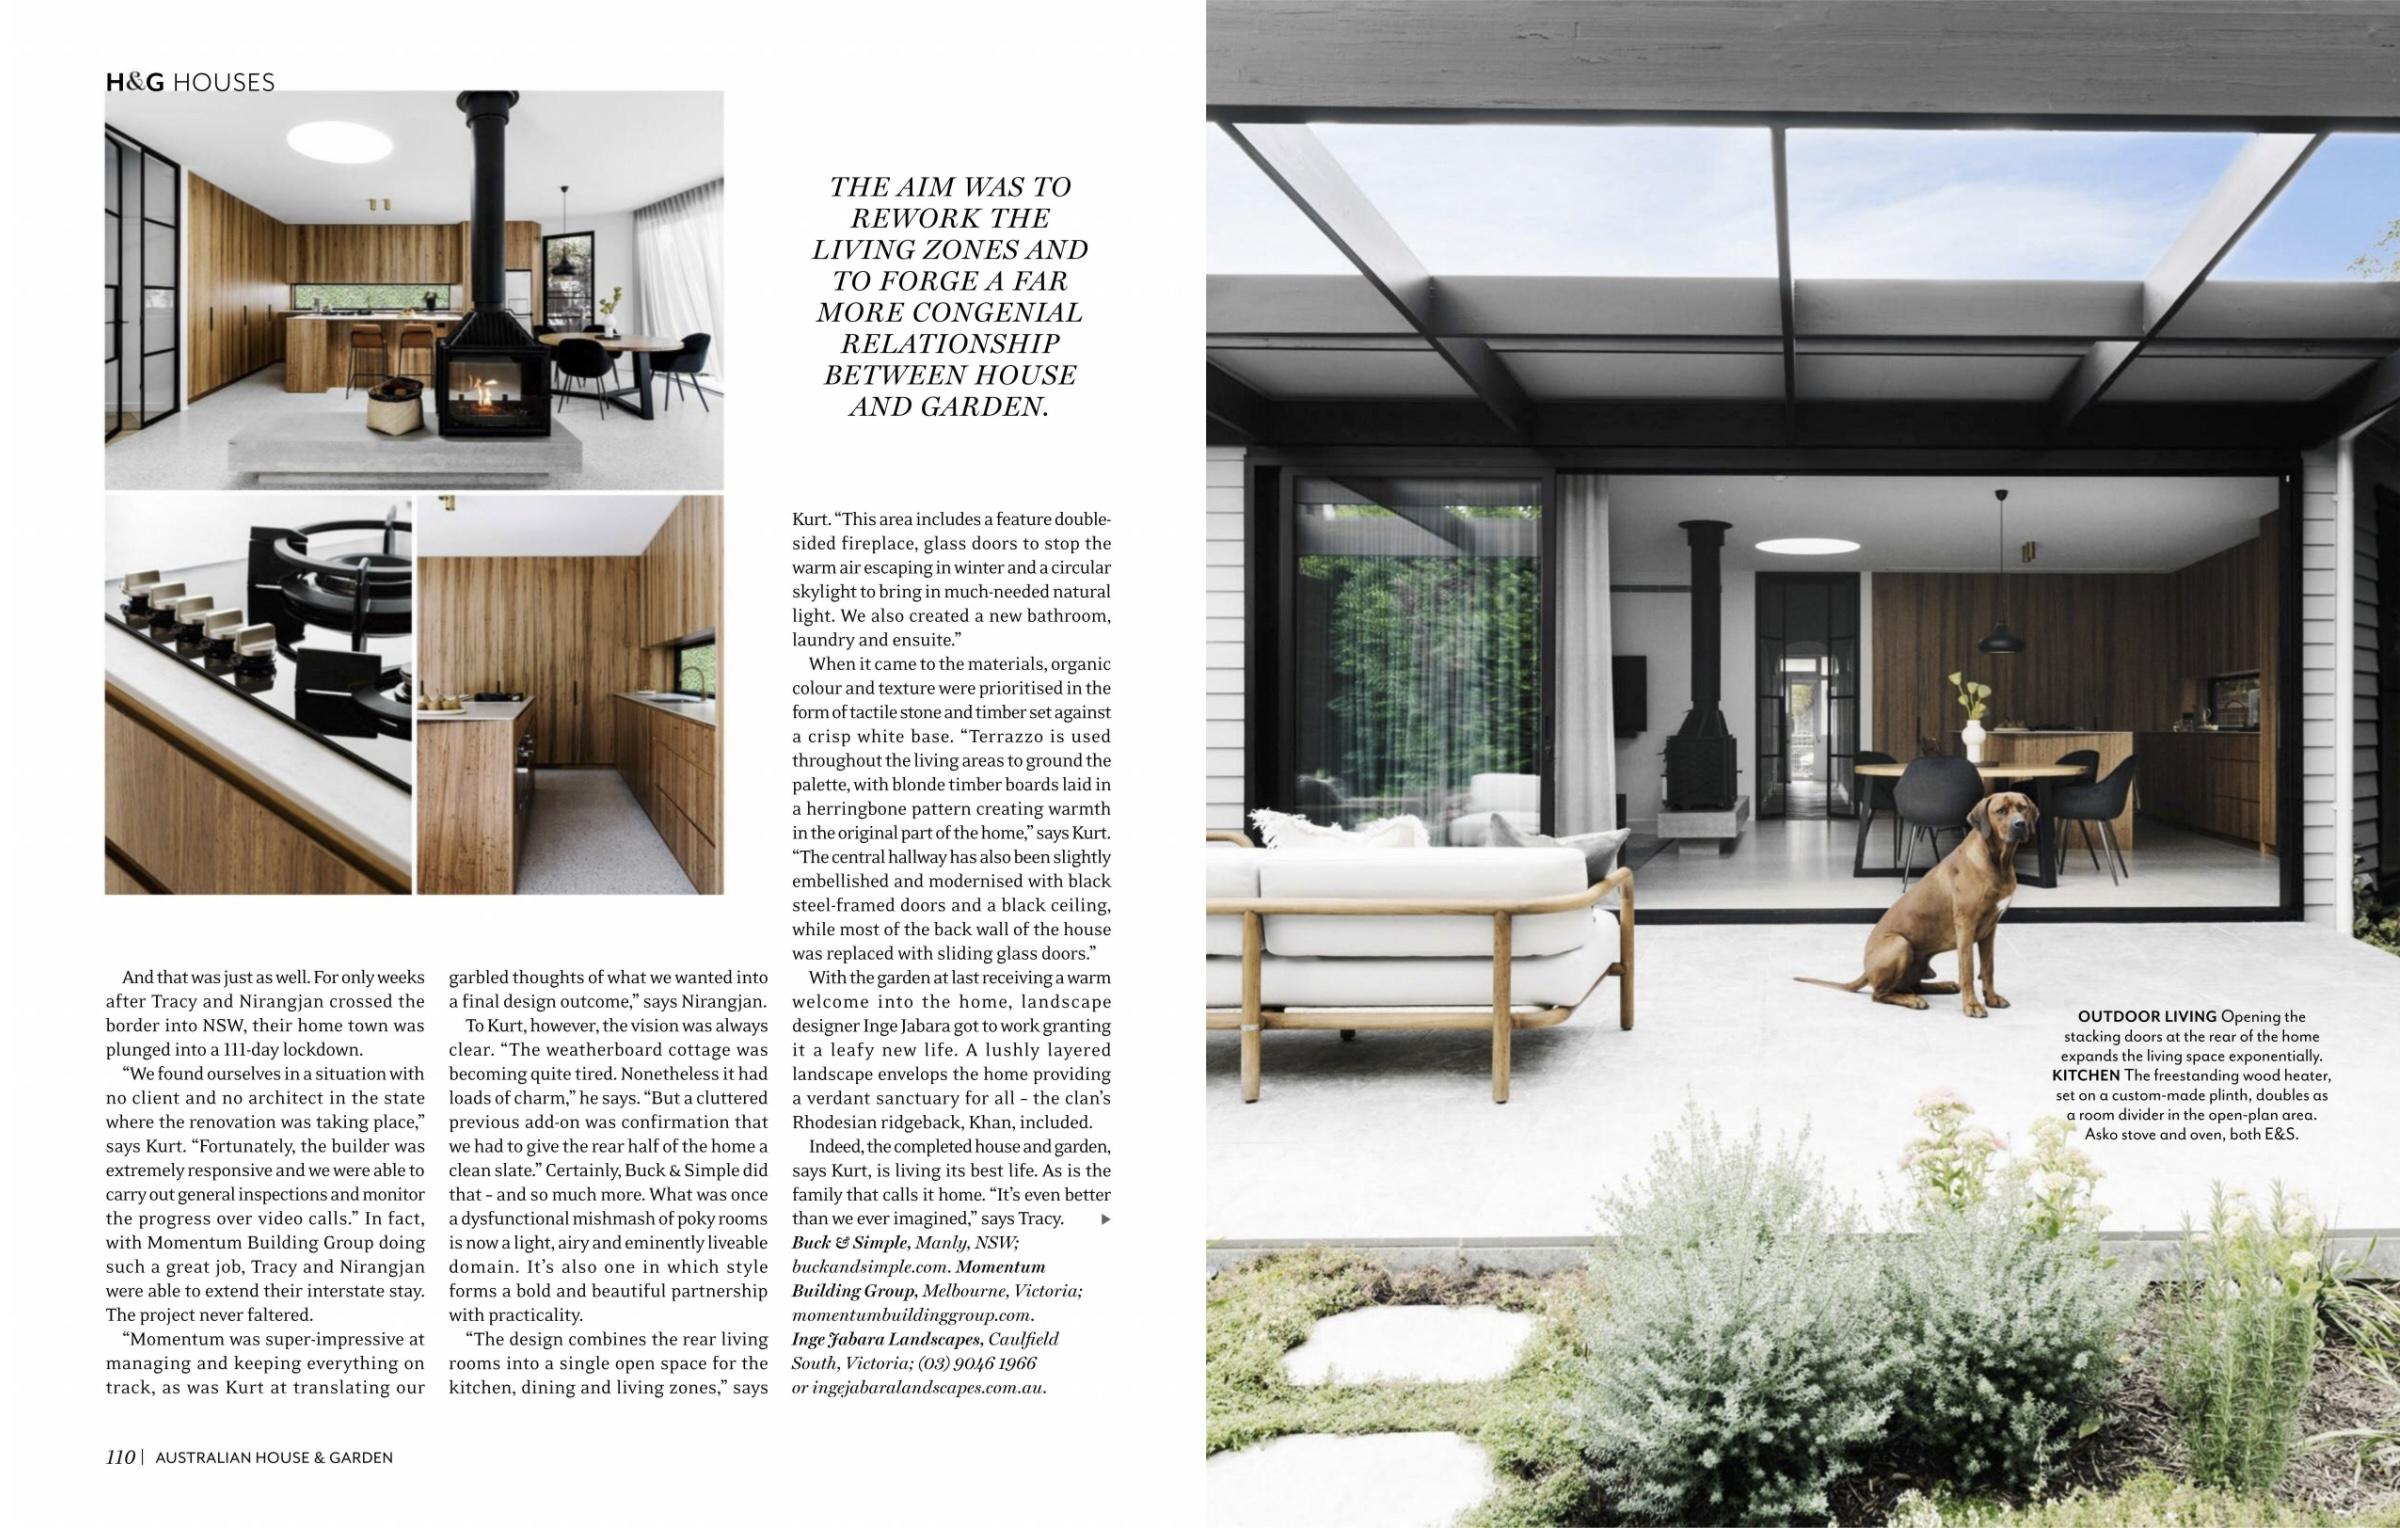 Australian House and Garden Architecture buckandsimple design house fitzroy kitchen bathroom renovation